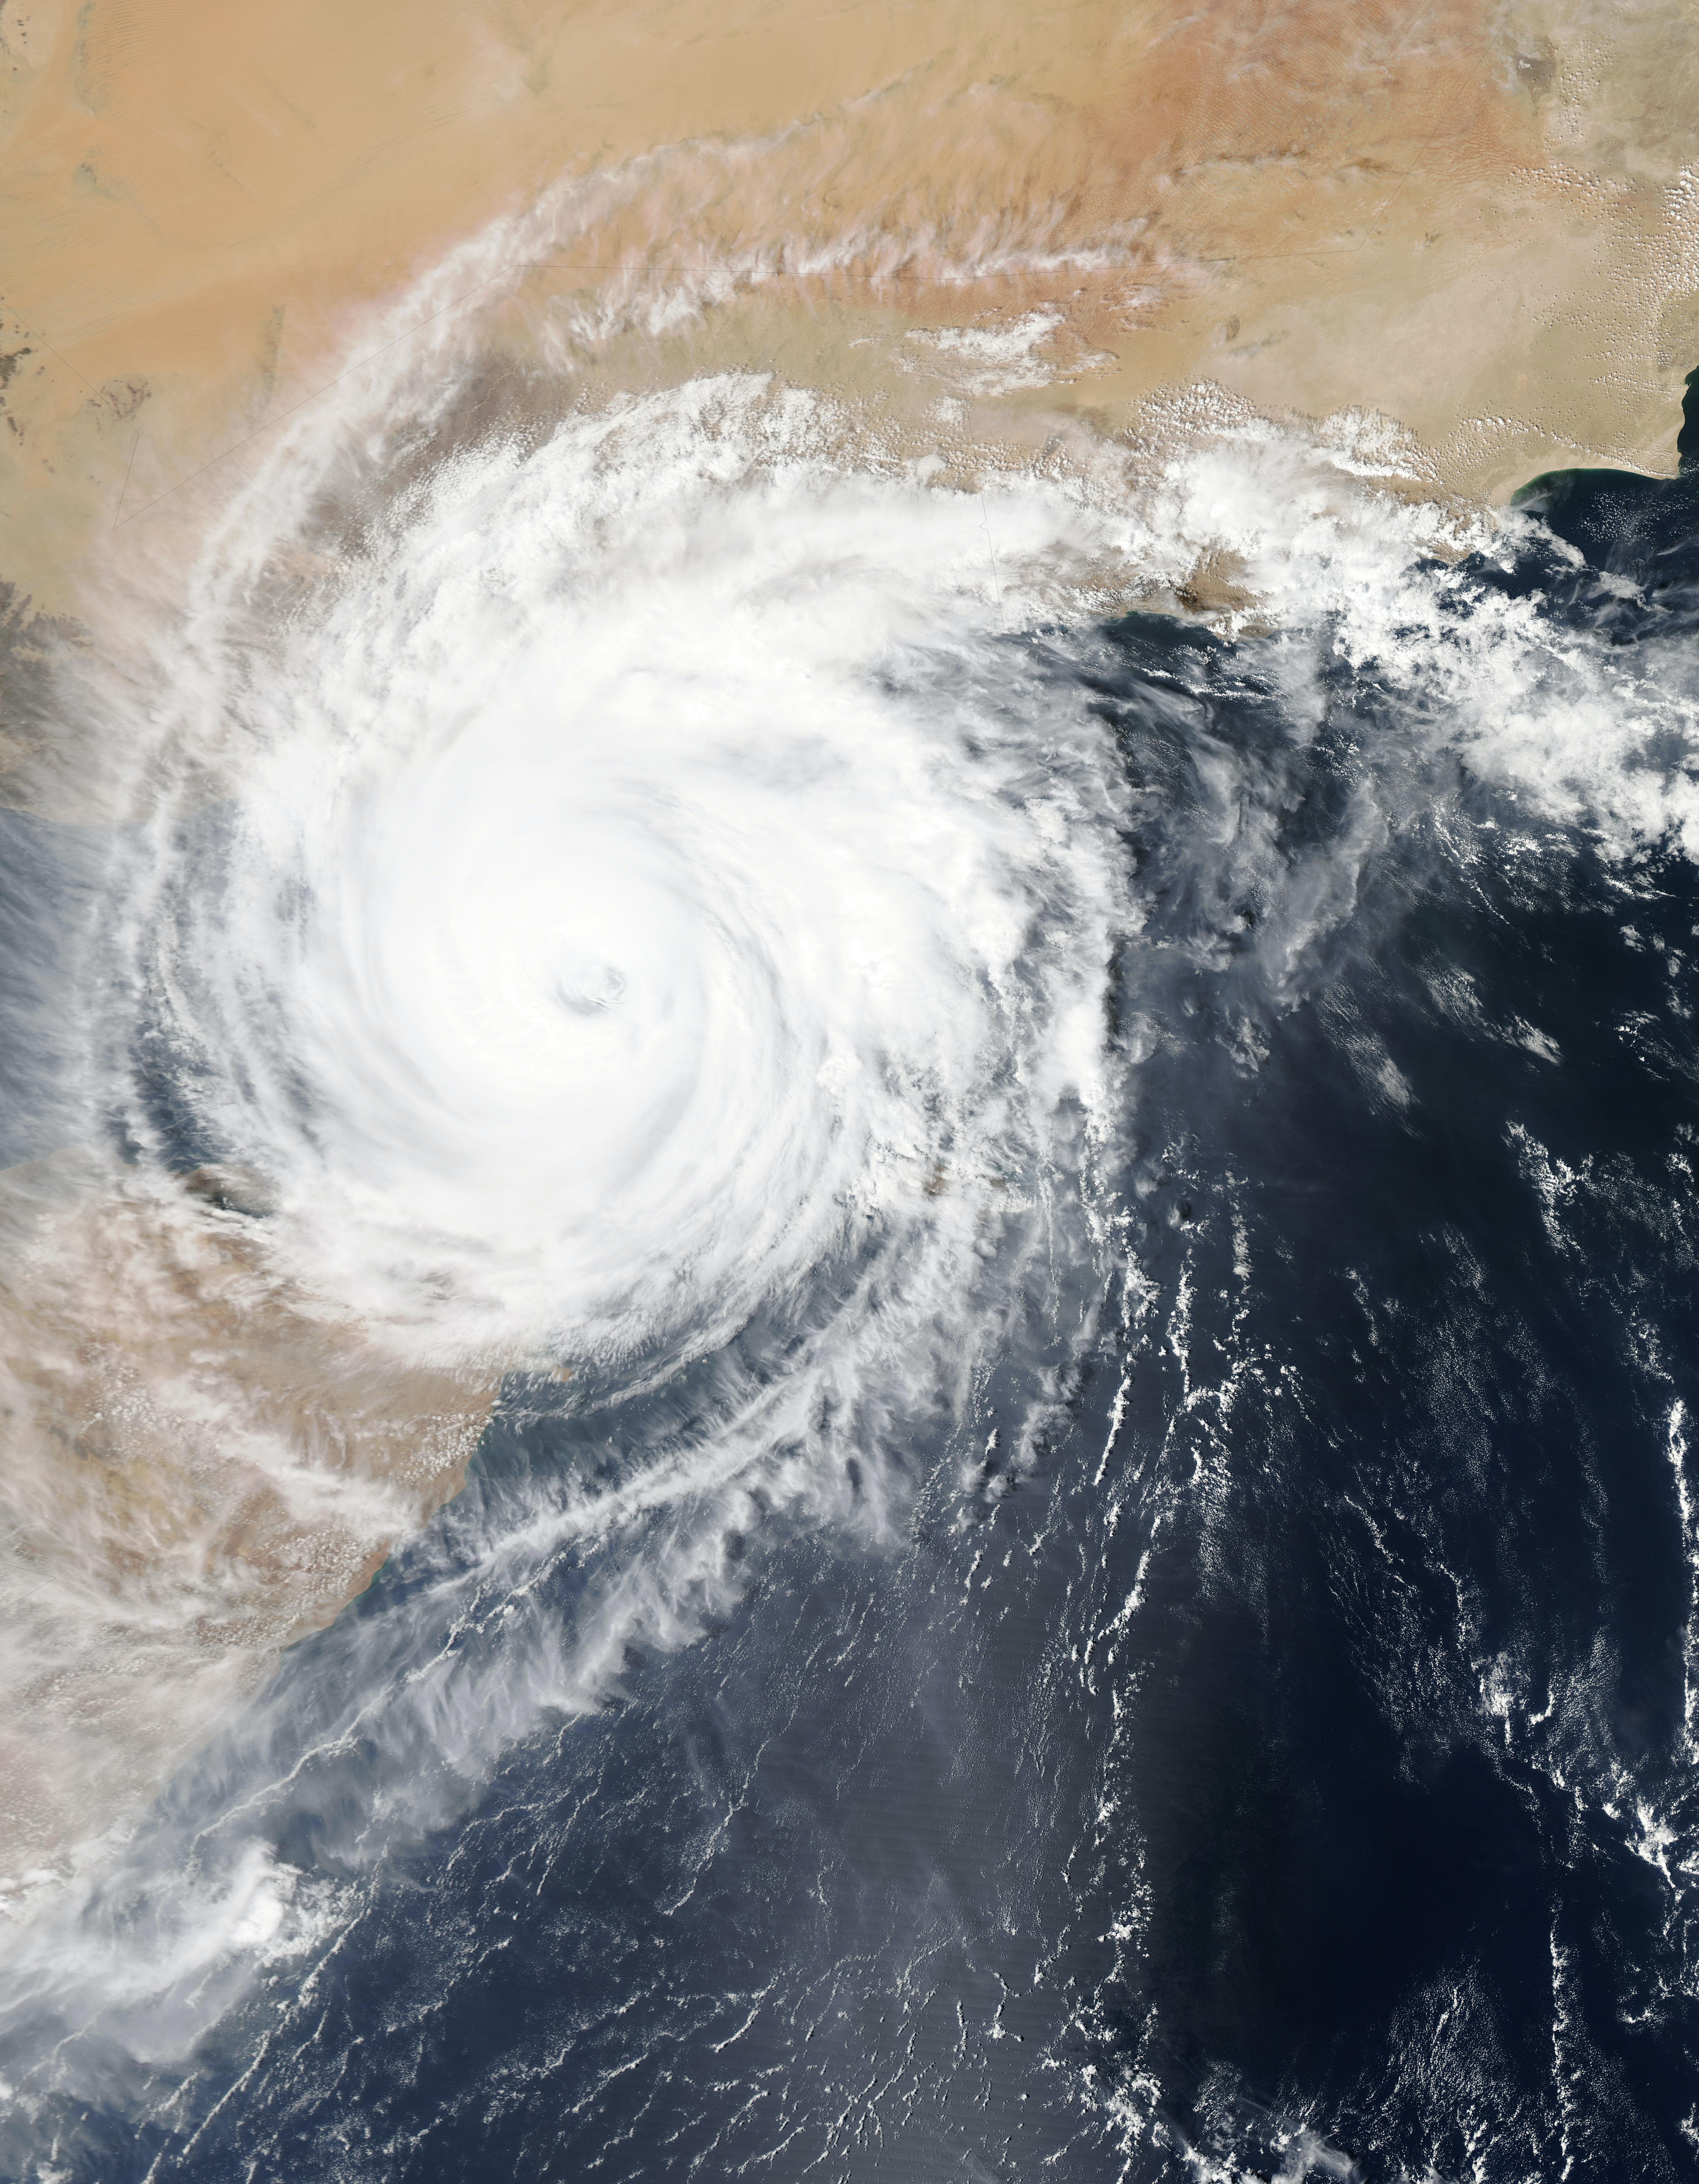 A hurricane or storm over Yemen